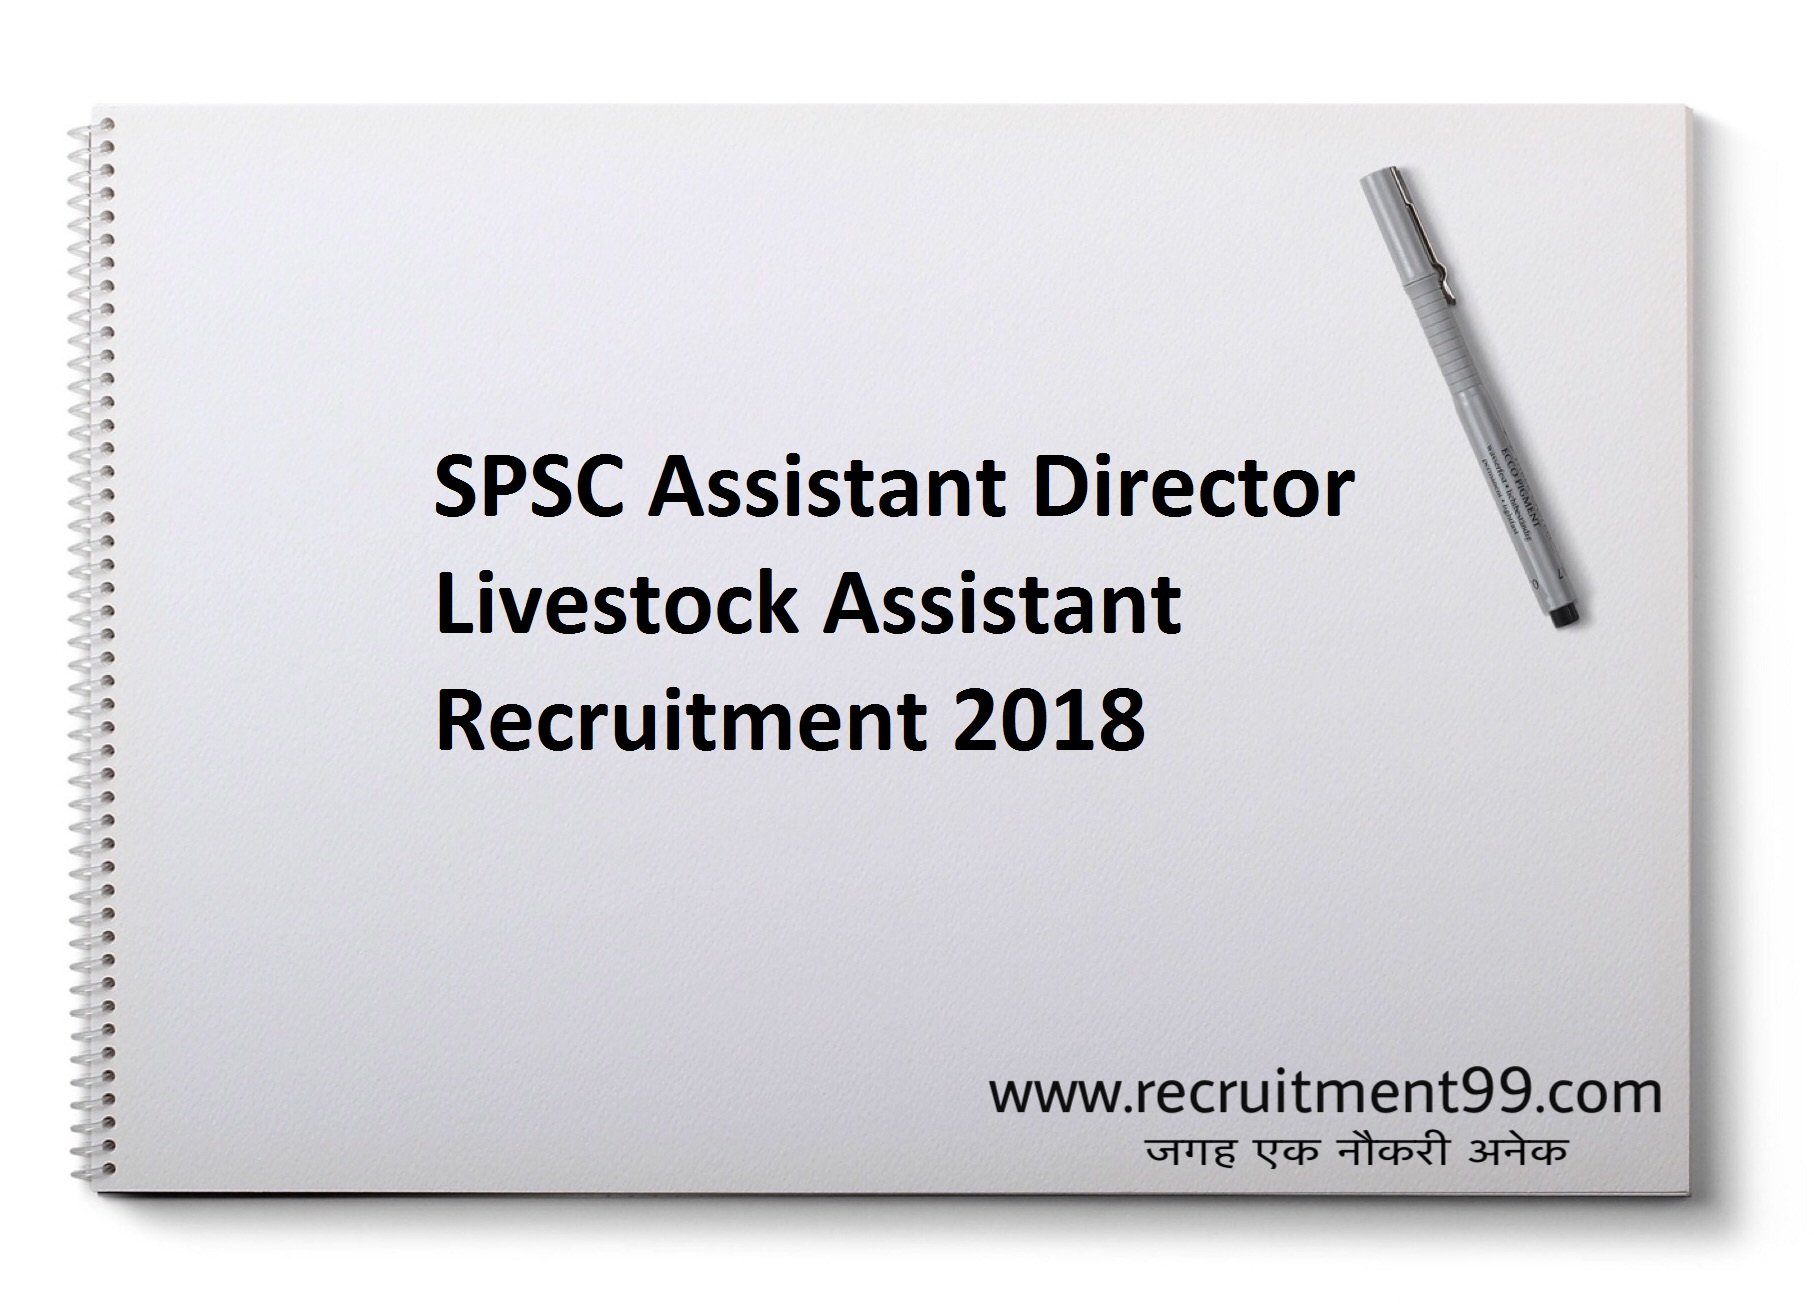 SPSC Assistant Director Livestock Assistant Recruitment Admit Card Result 2018